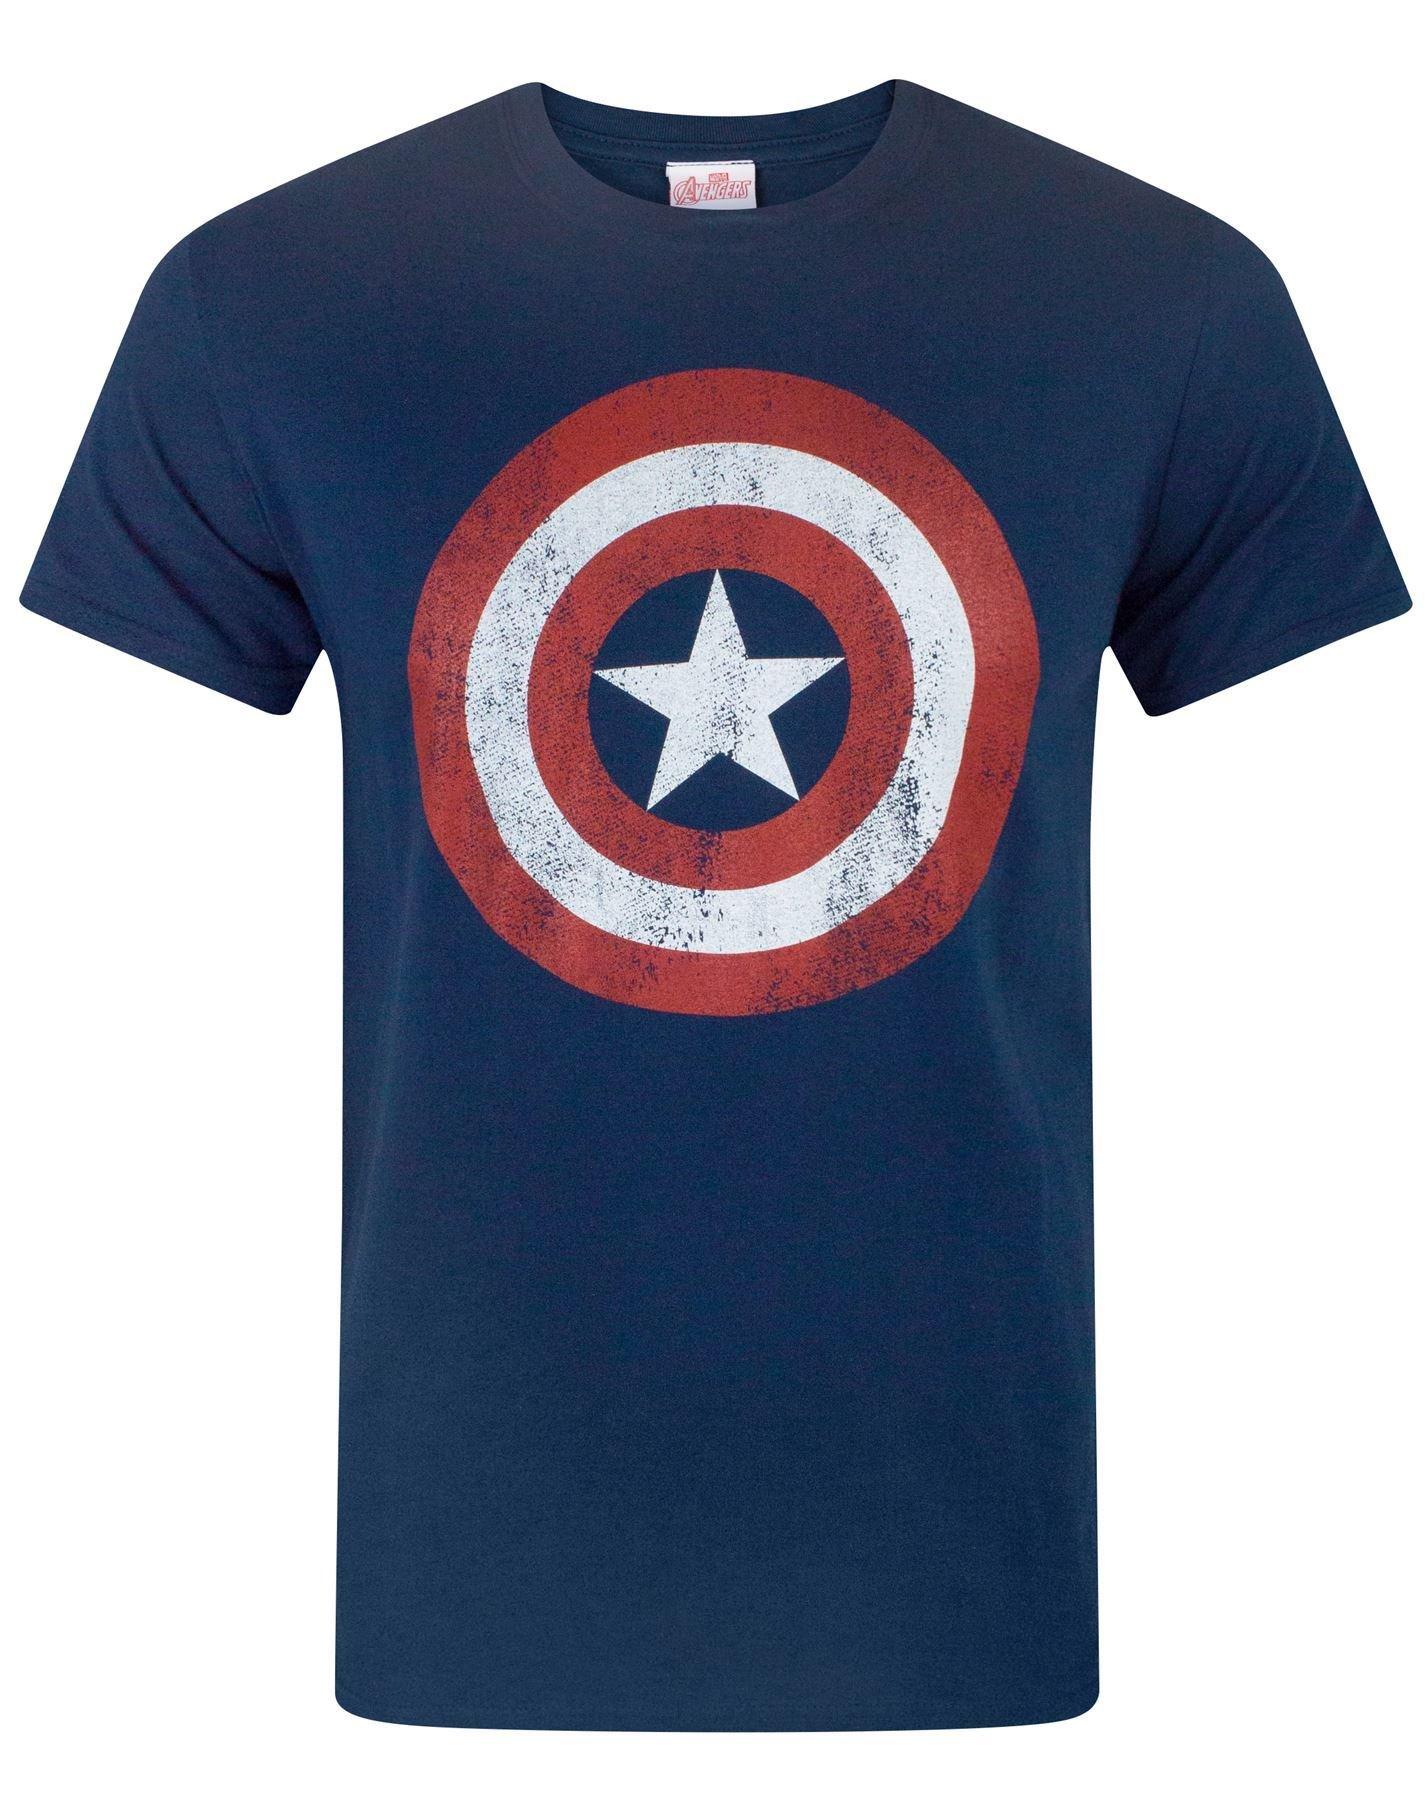 5XL Licensed Marvel Comics Captain America Distressed Shield Mens T-Shirt S